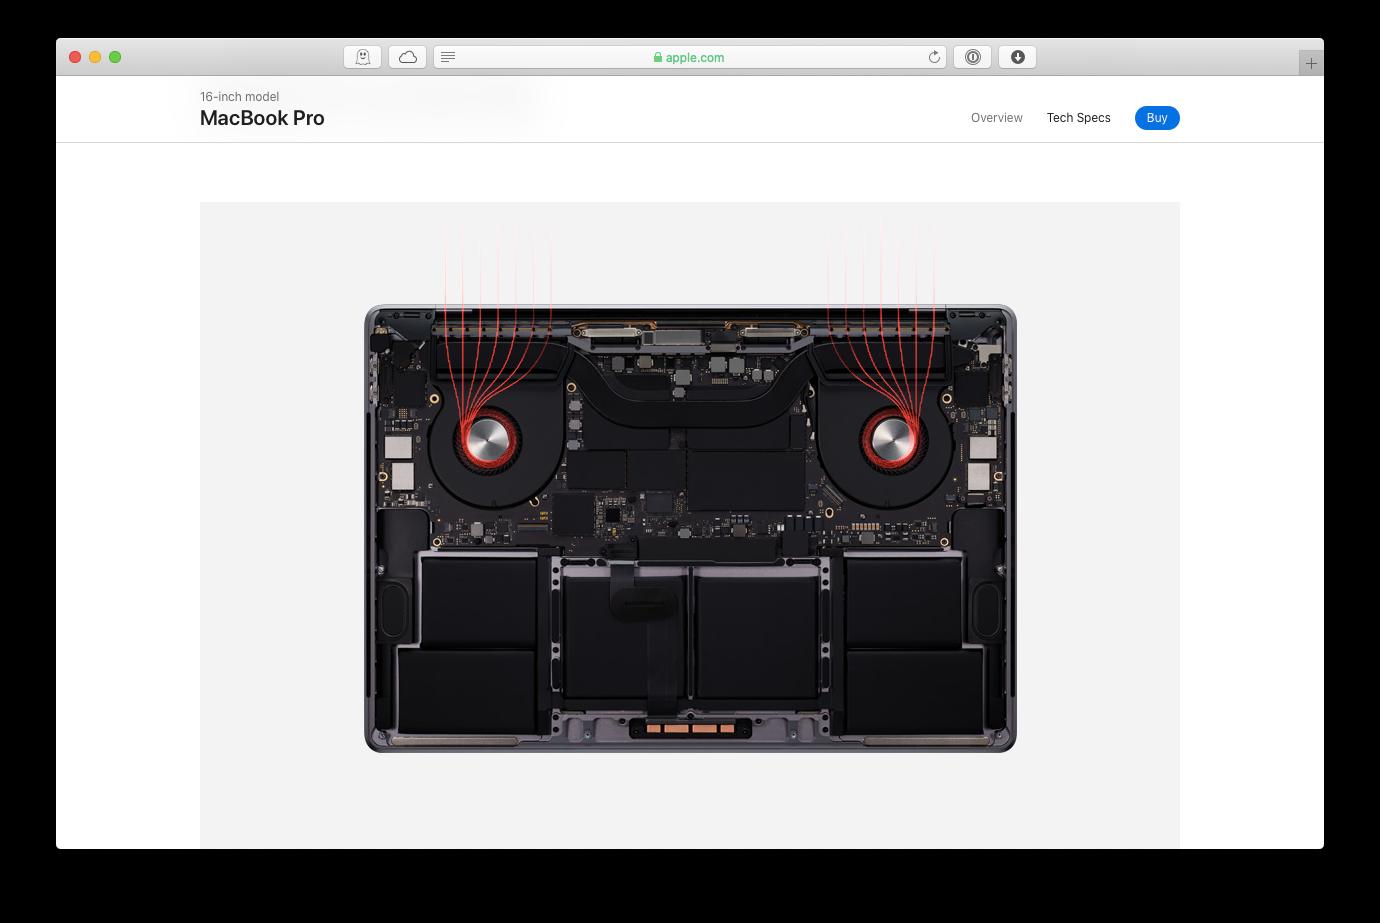 MacBook thermal heat pro 16-inch